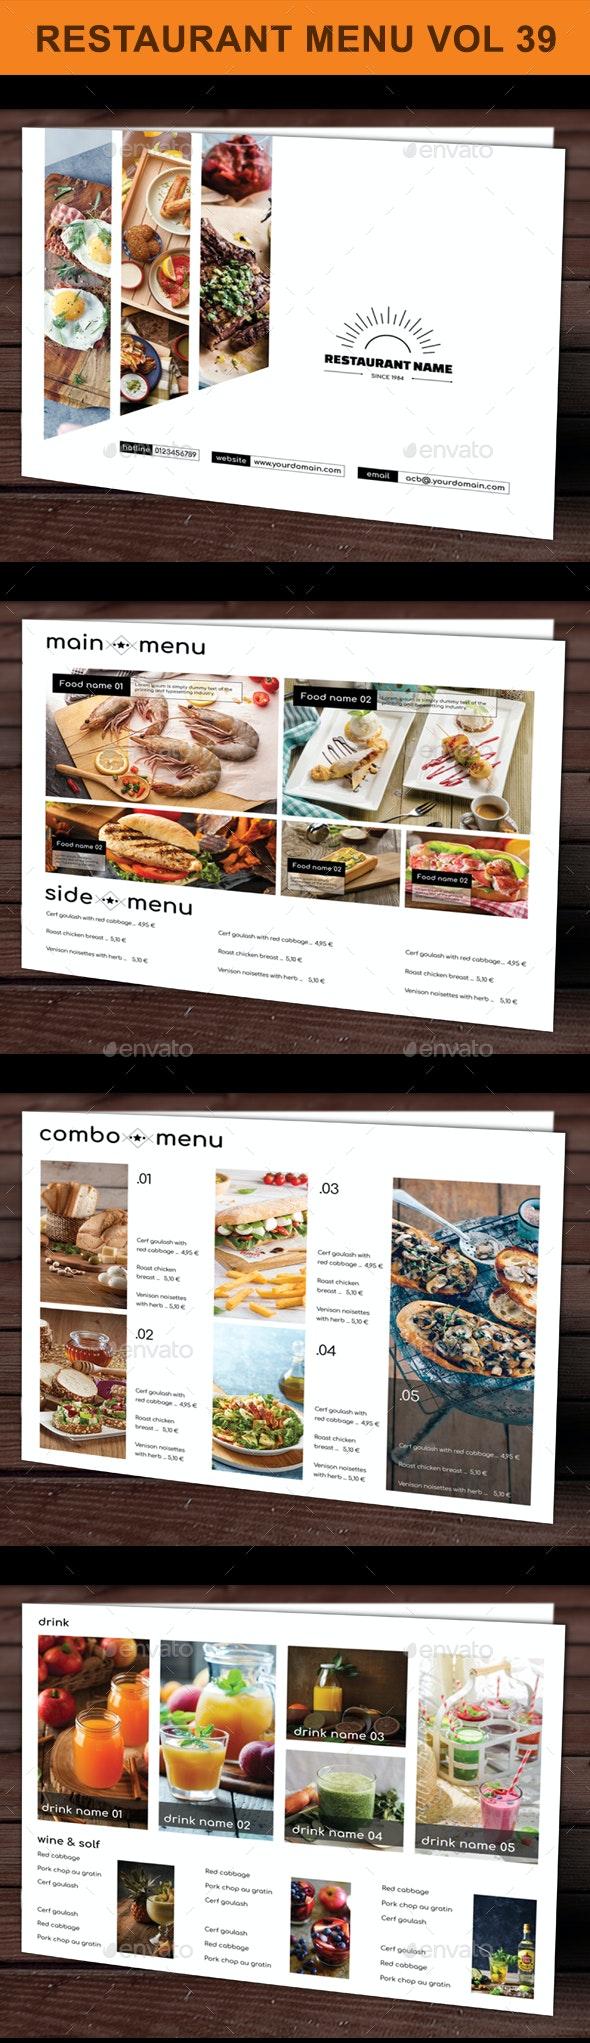 Restaurant Menu vol 39 - Food Menus Print Templates